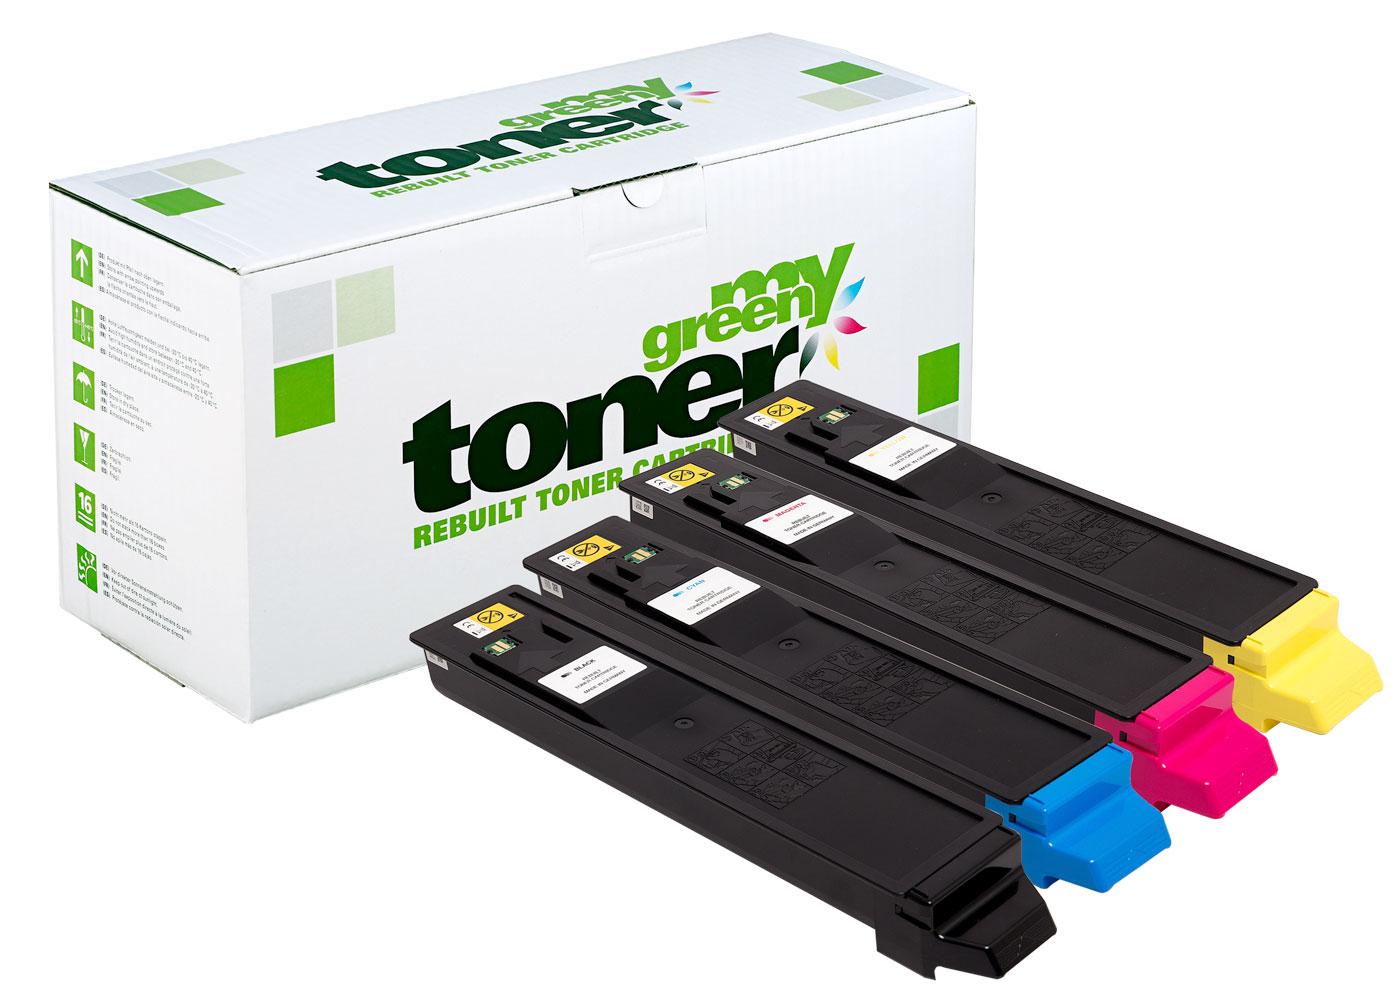 Rebuilt toner cartridge for Kyocera ECOSYS M8124/8130